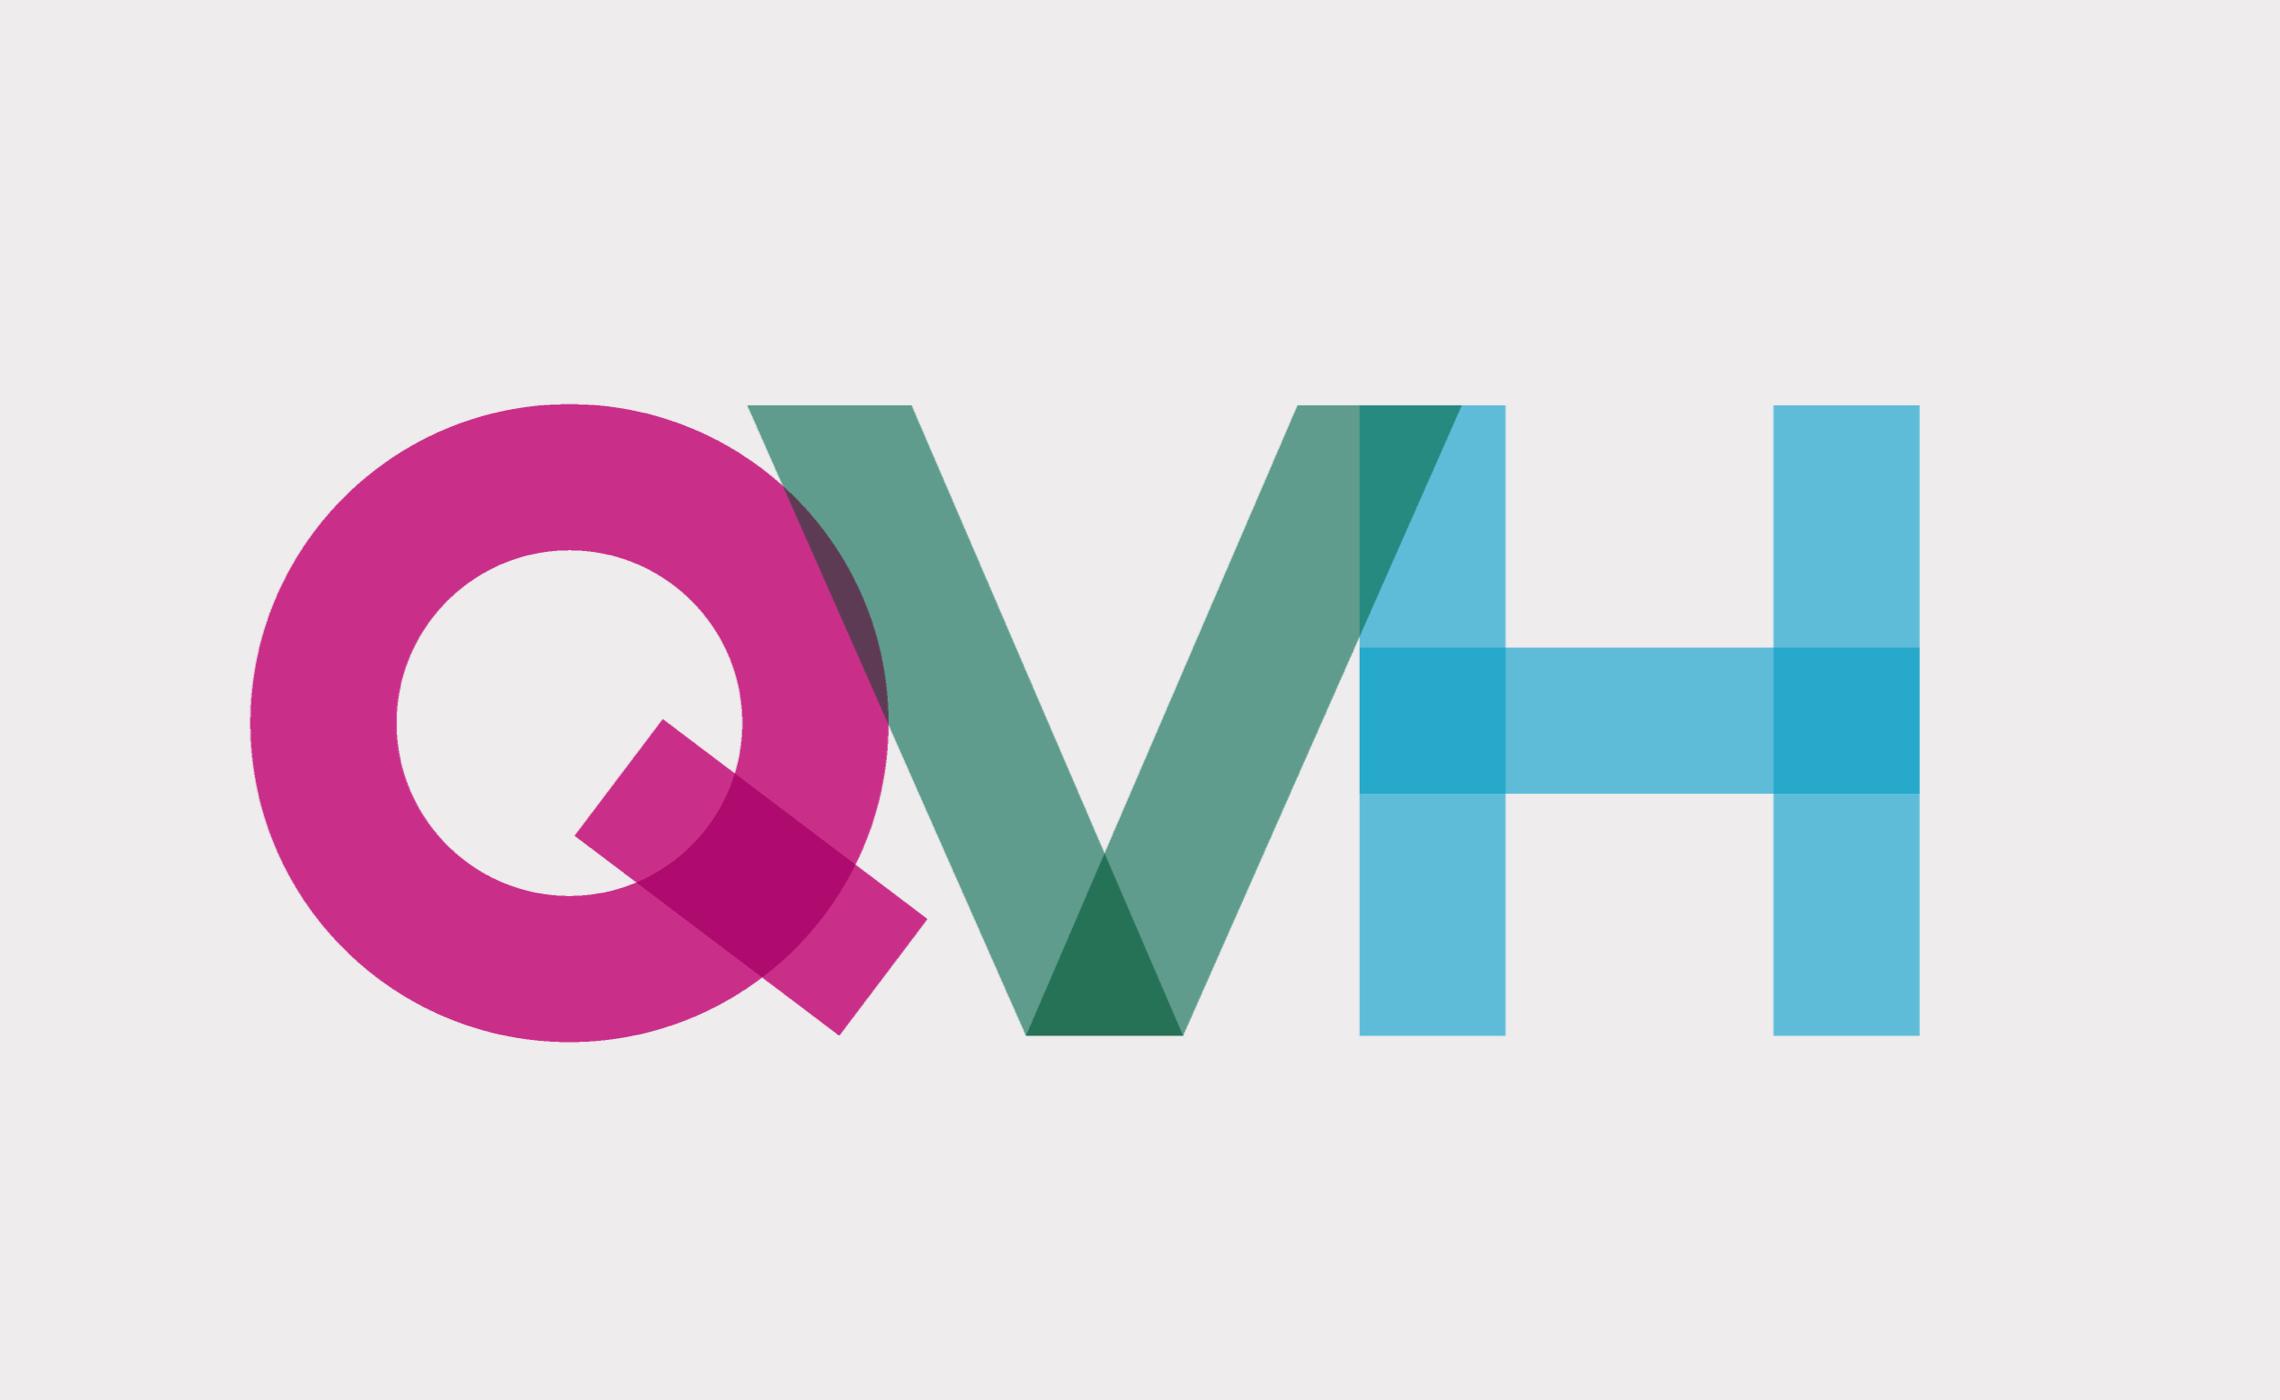 QVH – brandmark